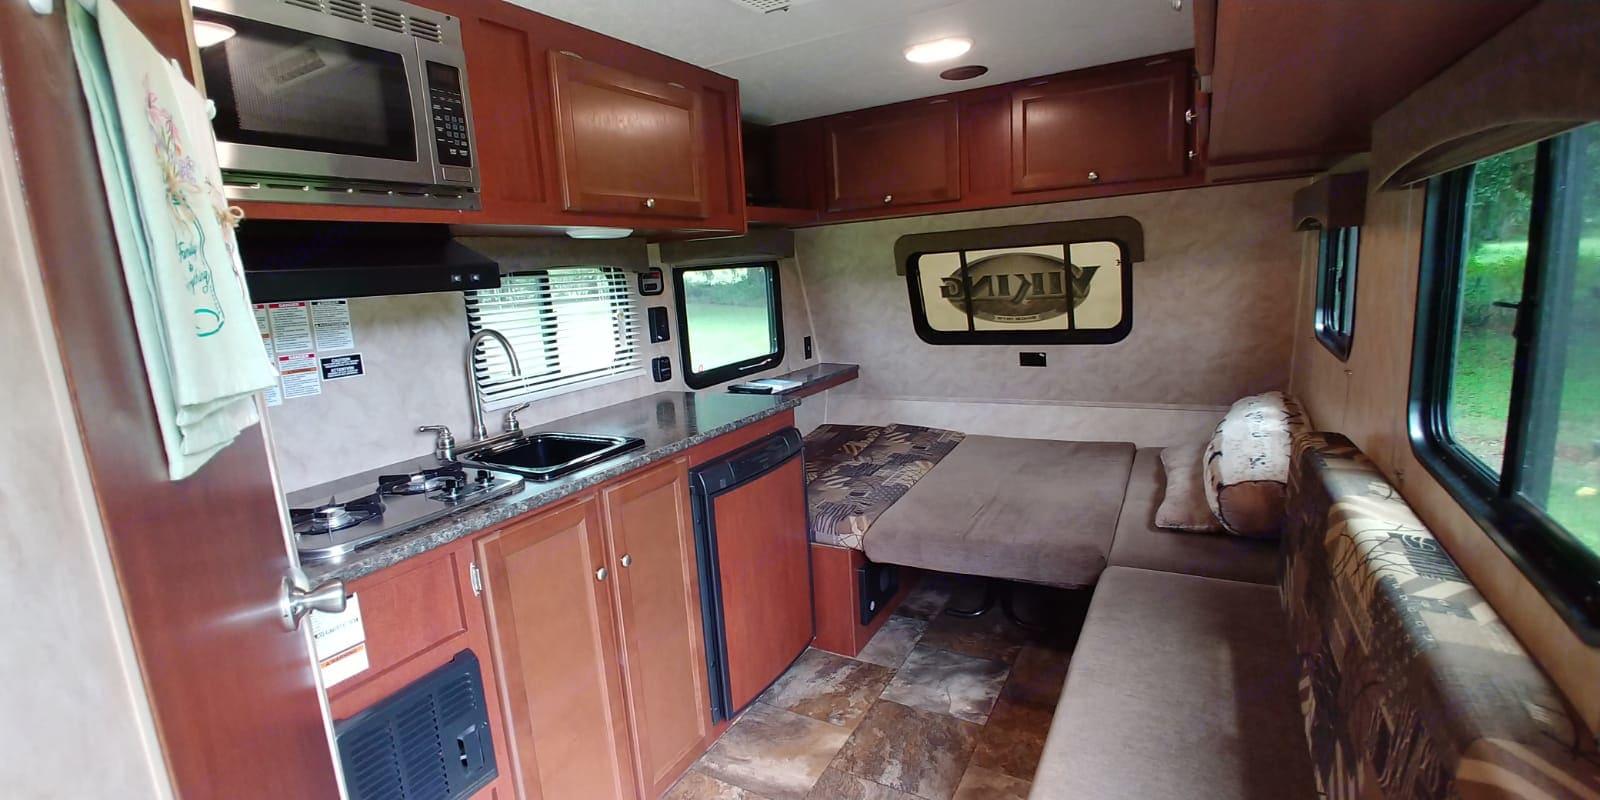 Efficient kitchen layout. Coachmen Viking 2015